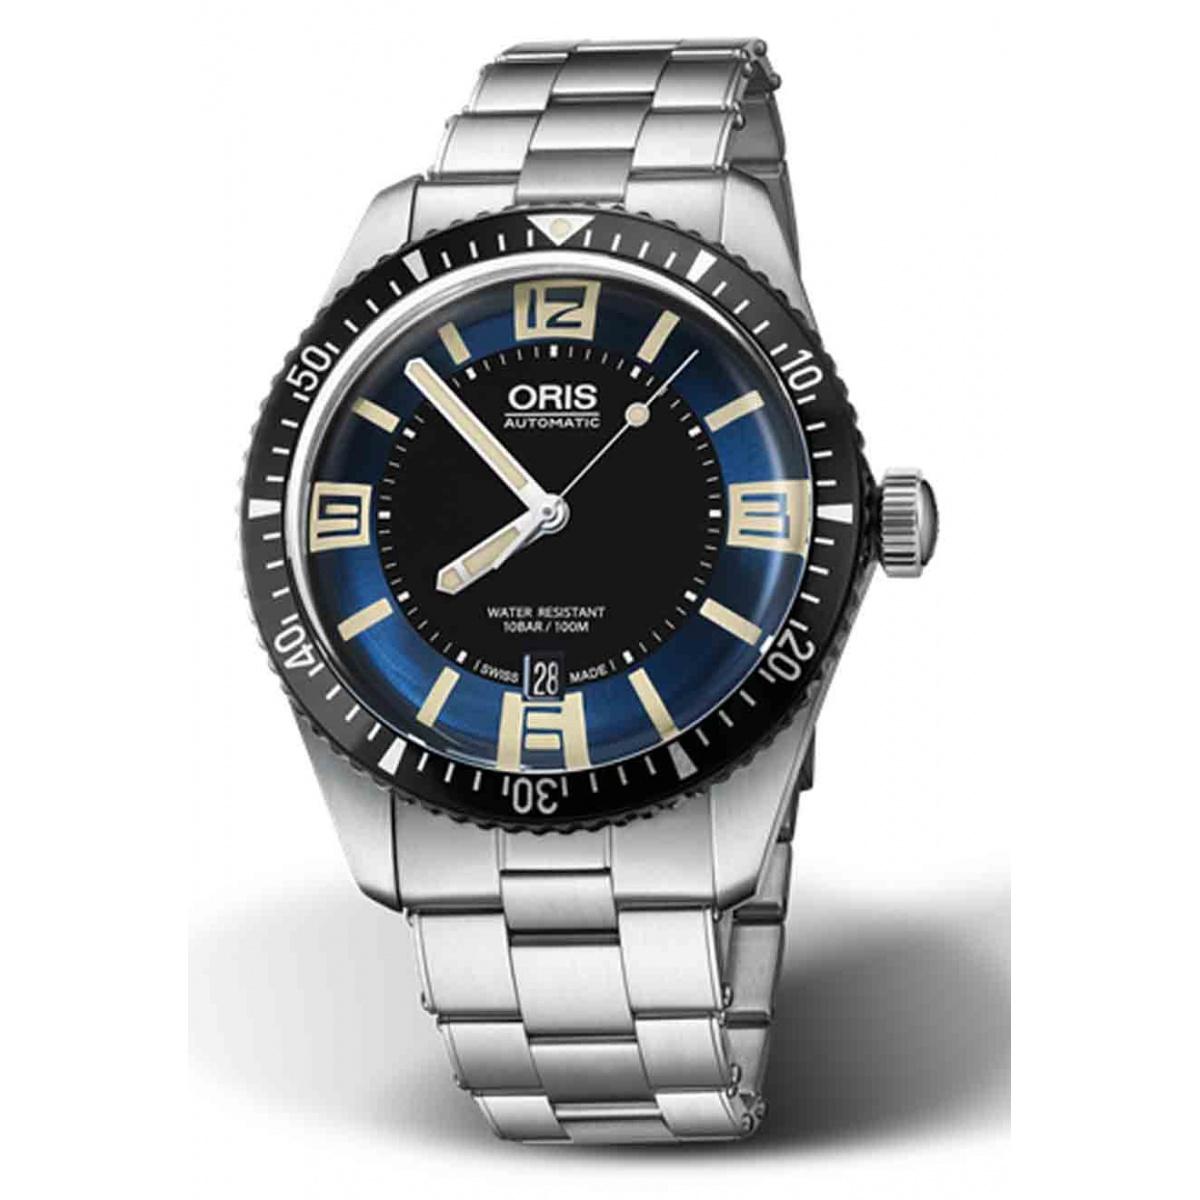 ORIS DIVERS SIXTY-FIVE -100 M ∅40 mm, Esfera azul y negra número, brazalete de acero